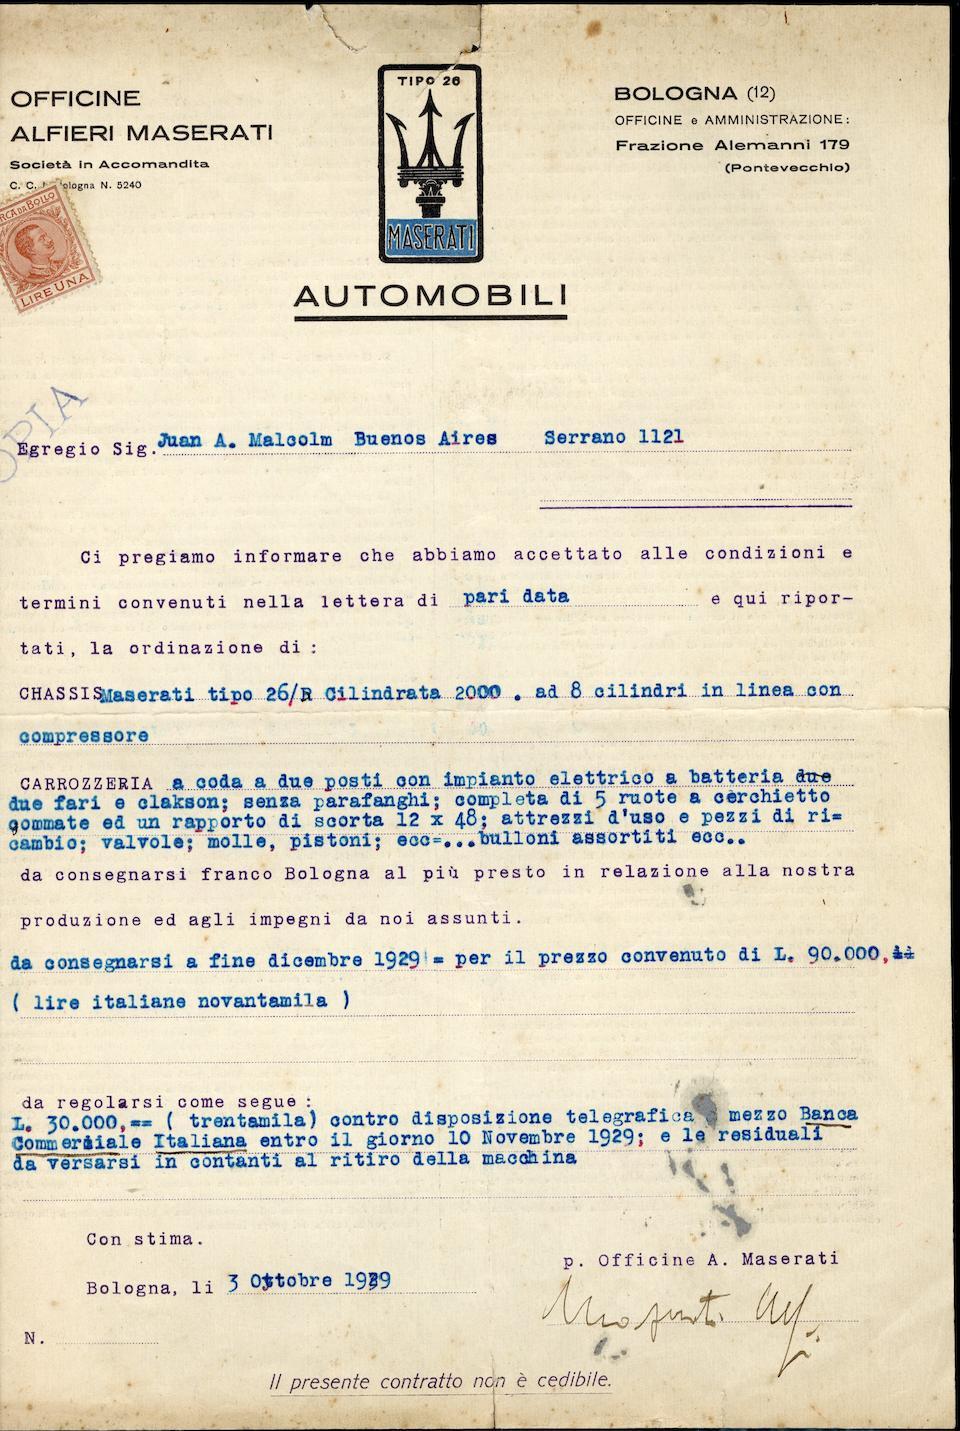 The ex-Juan Augusto Malcolm/Argentina,1928 Maserati Tipo 26B 2.1-Litre Sports, Gran Premio and Formule Libre Racing Two-Seater  Chassis no. 35